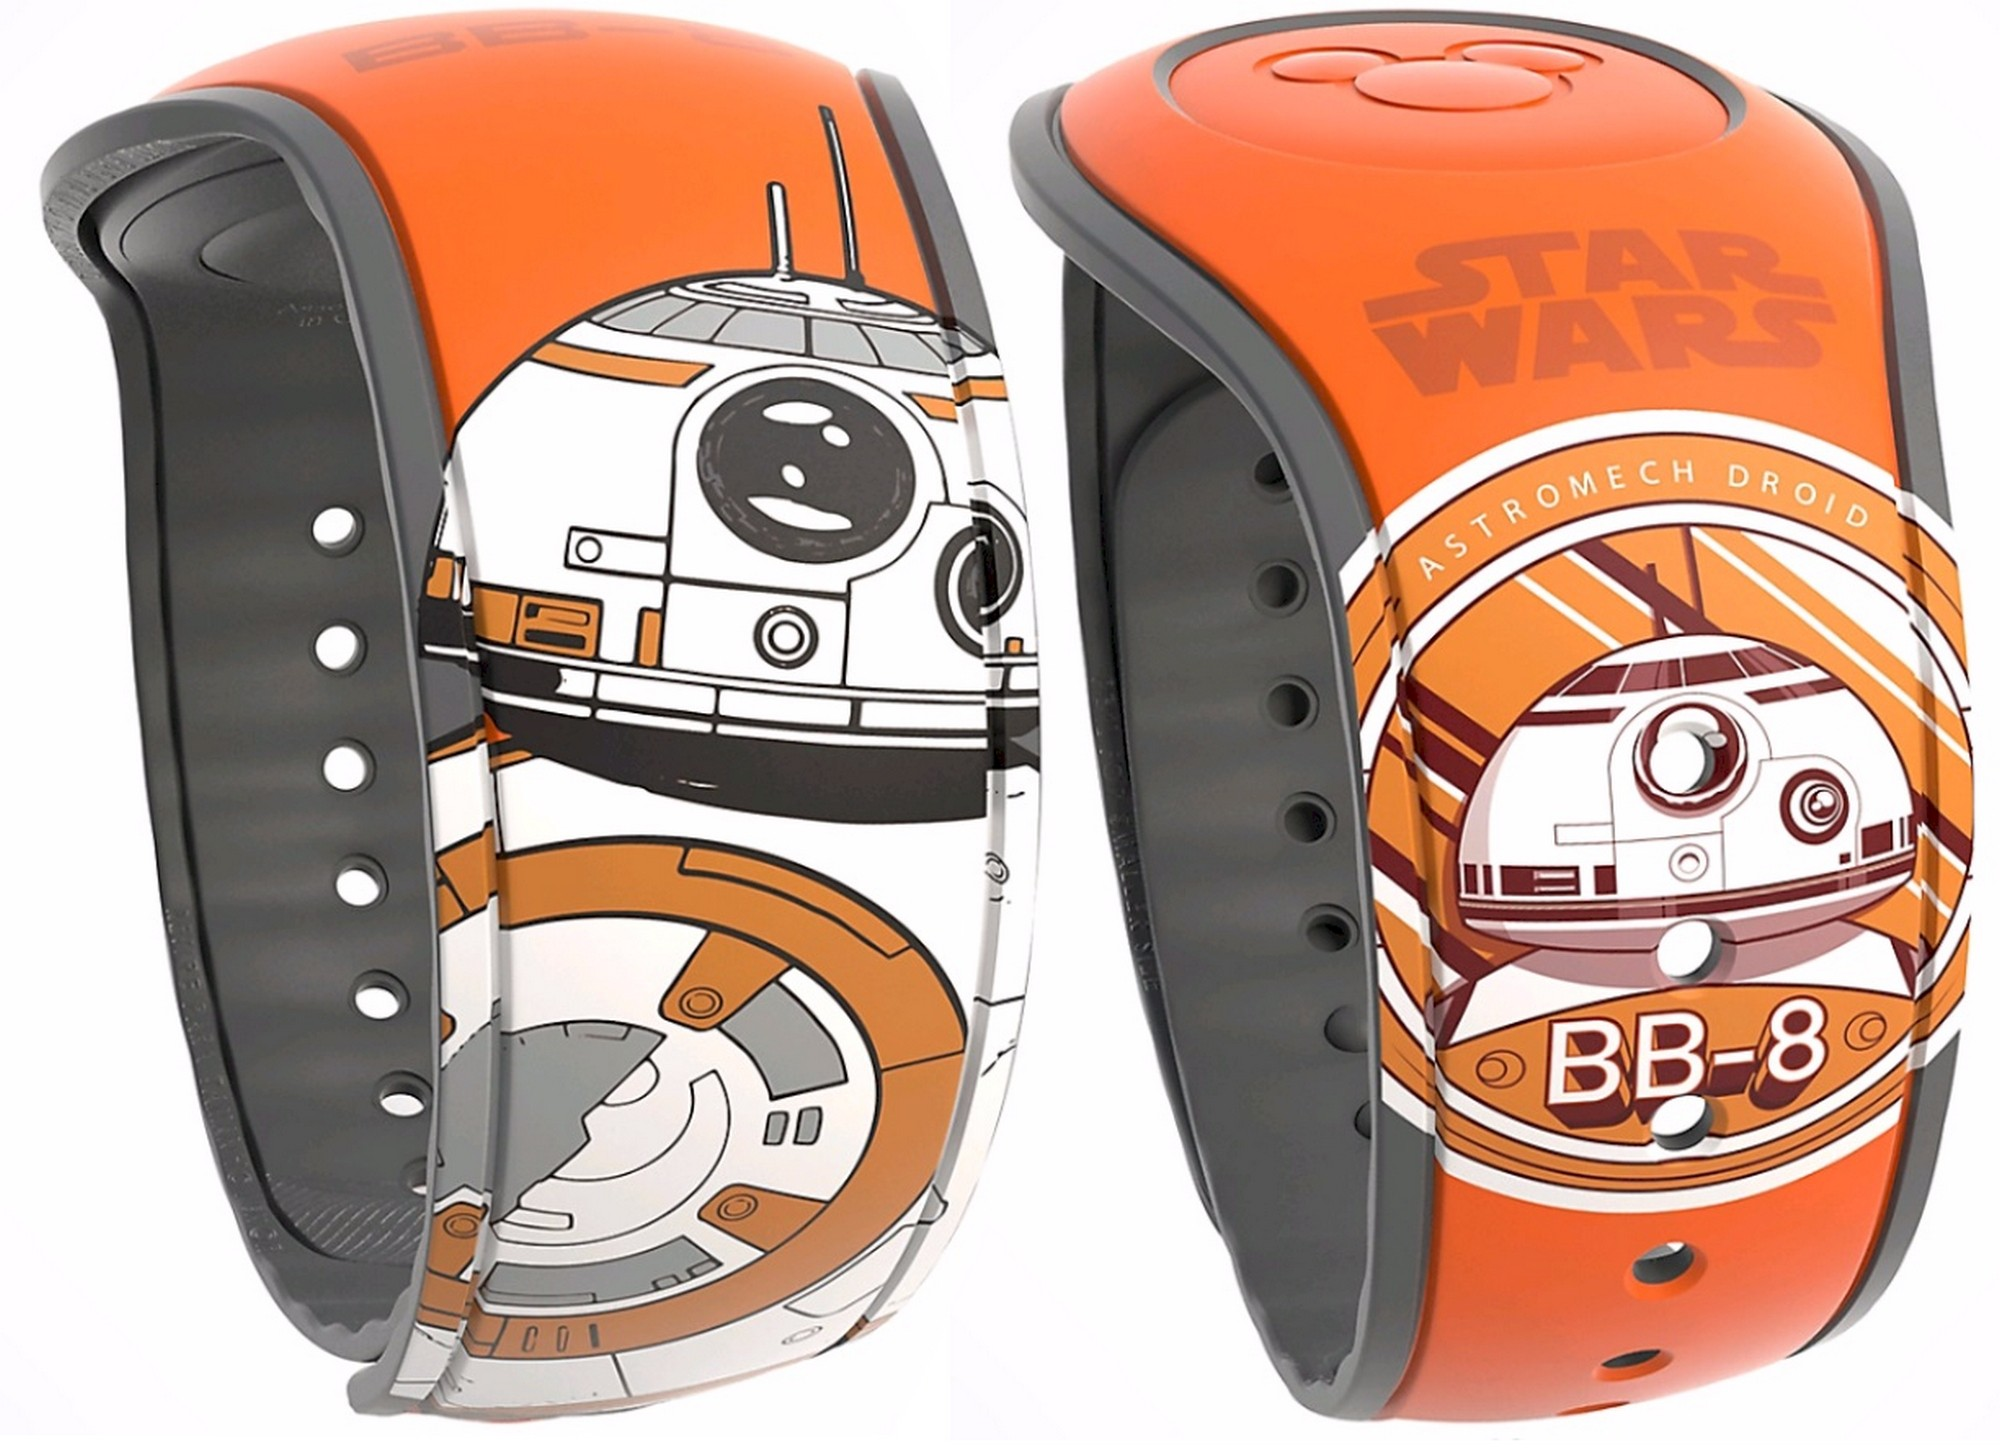 Star Wars: The Force Awakens BB-8 Graphic Magic Band 2 - Disney World Exclusive © Dizdude.com